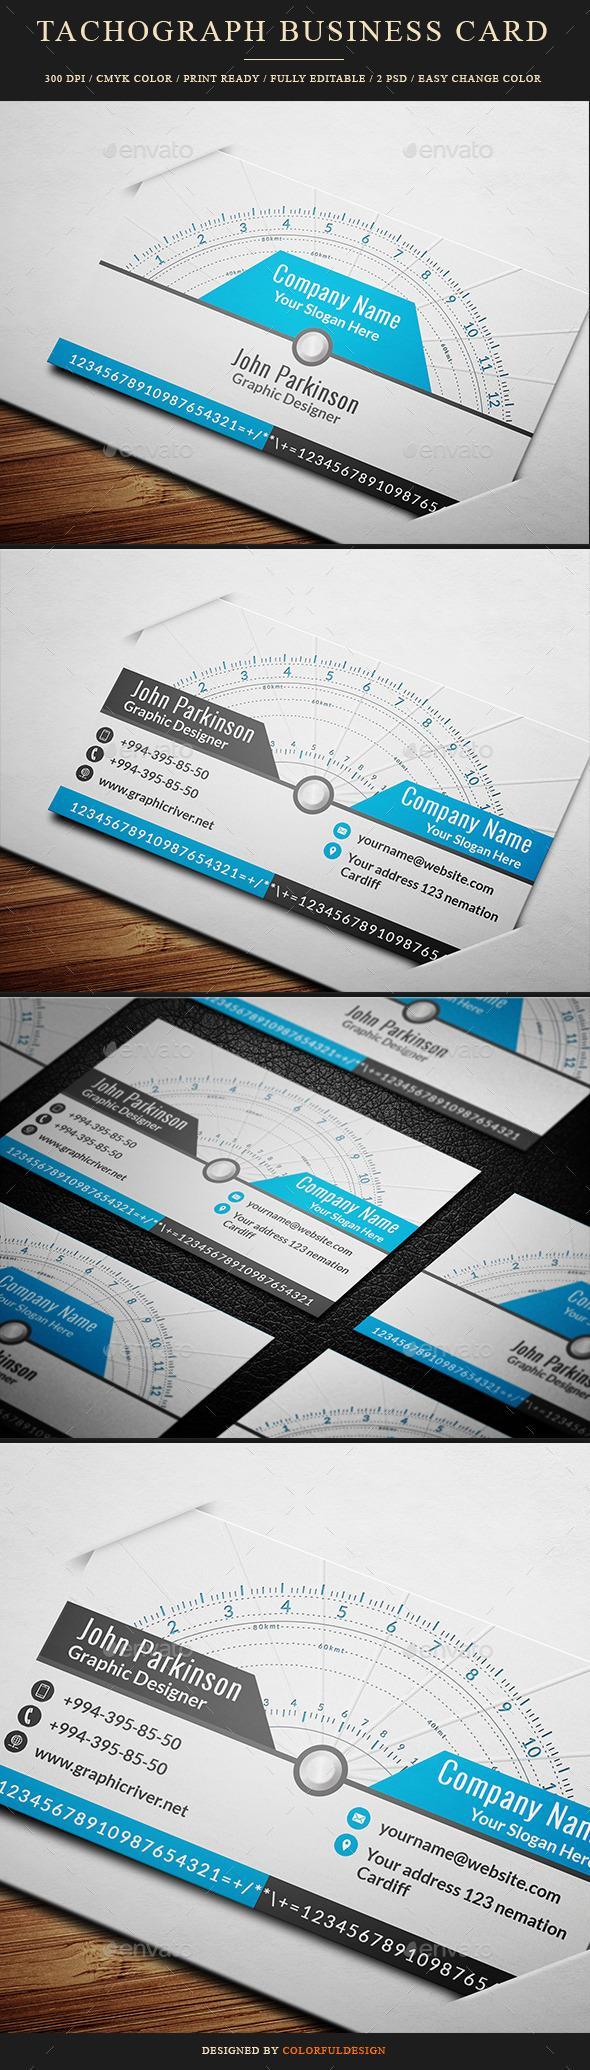 Tachograph Business Card Unique Business Cards Design Free Business Card Templates Business Card Template Design